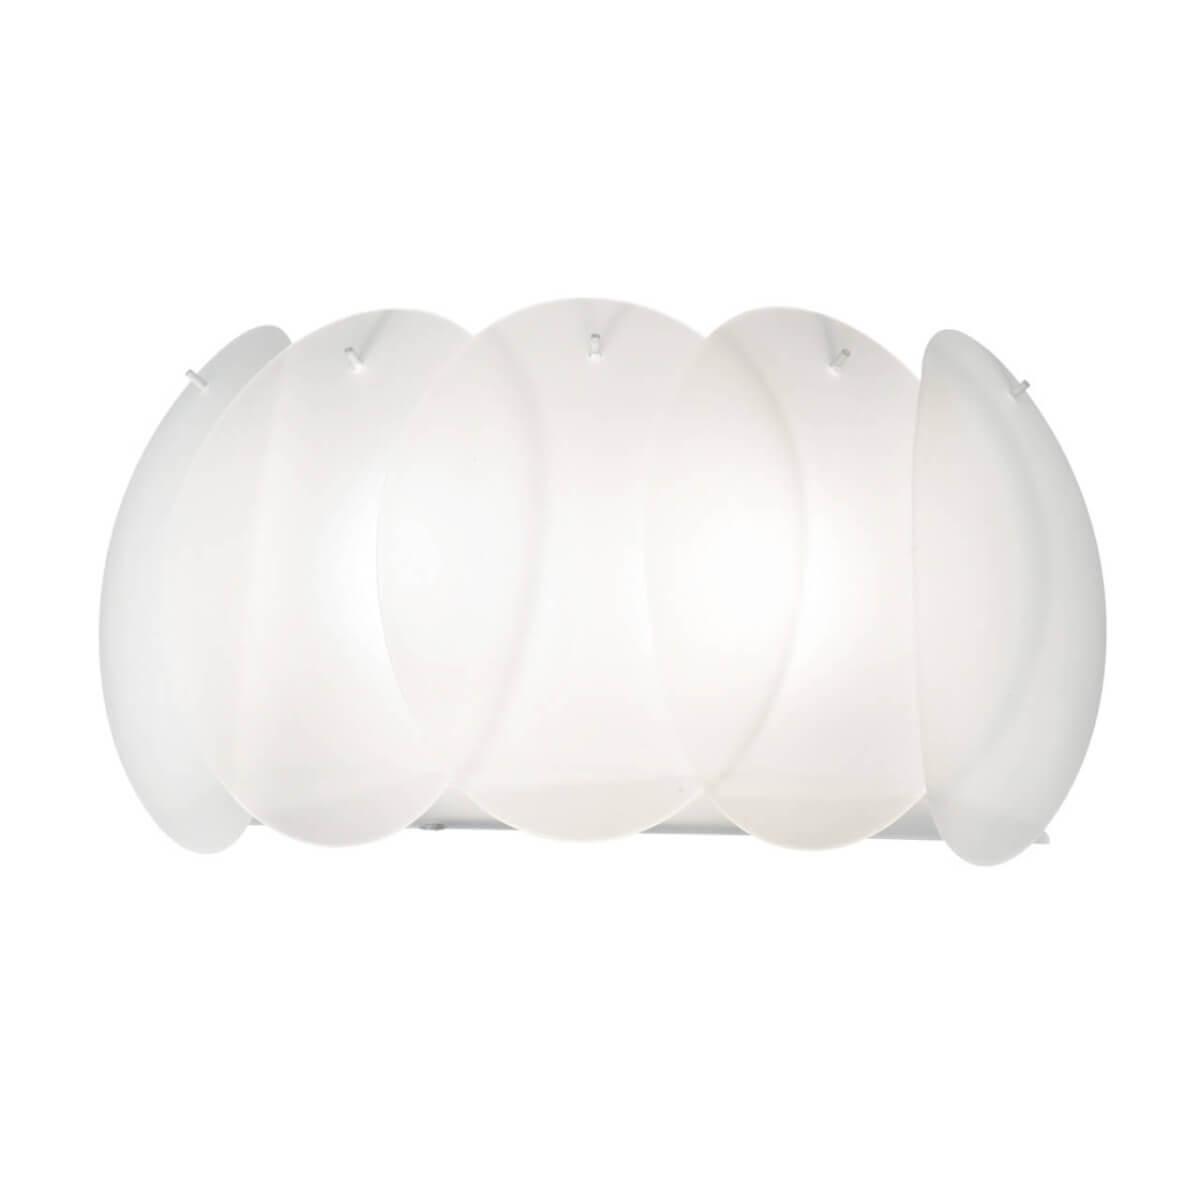 Светильник Ideal Lux Ovalino AP2 Ovalino Bianco